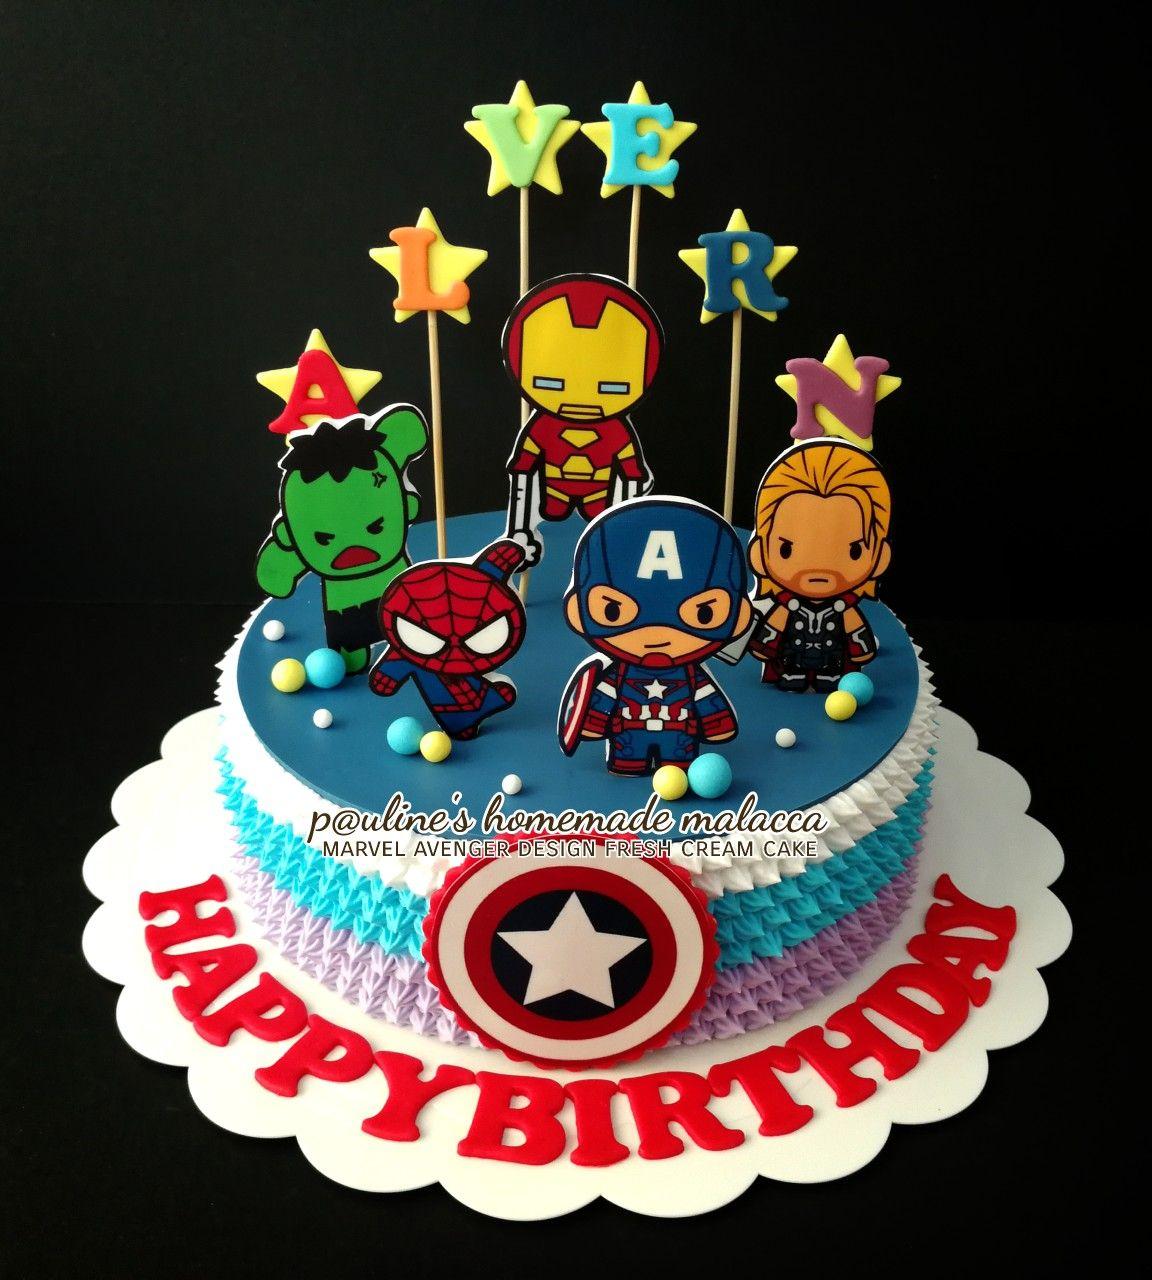 Marvel Avenger Edible Image Fresh Cream Cake Avenger Cake Cake Fresh Cream,Short Hair Design For Wedding Party